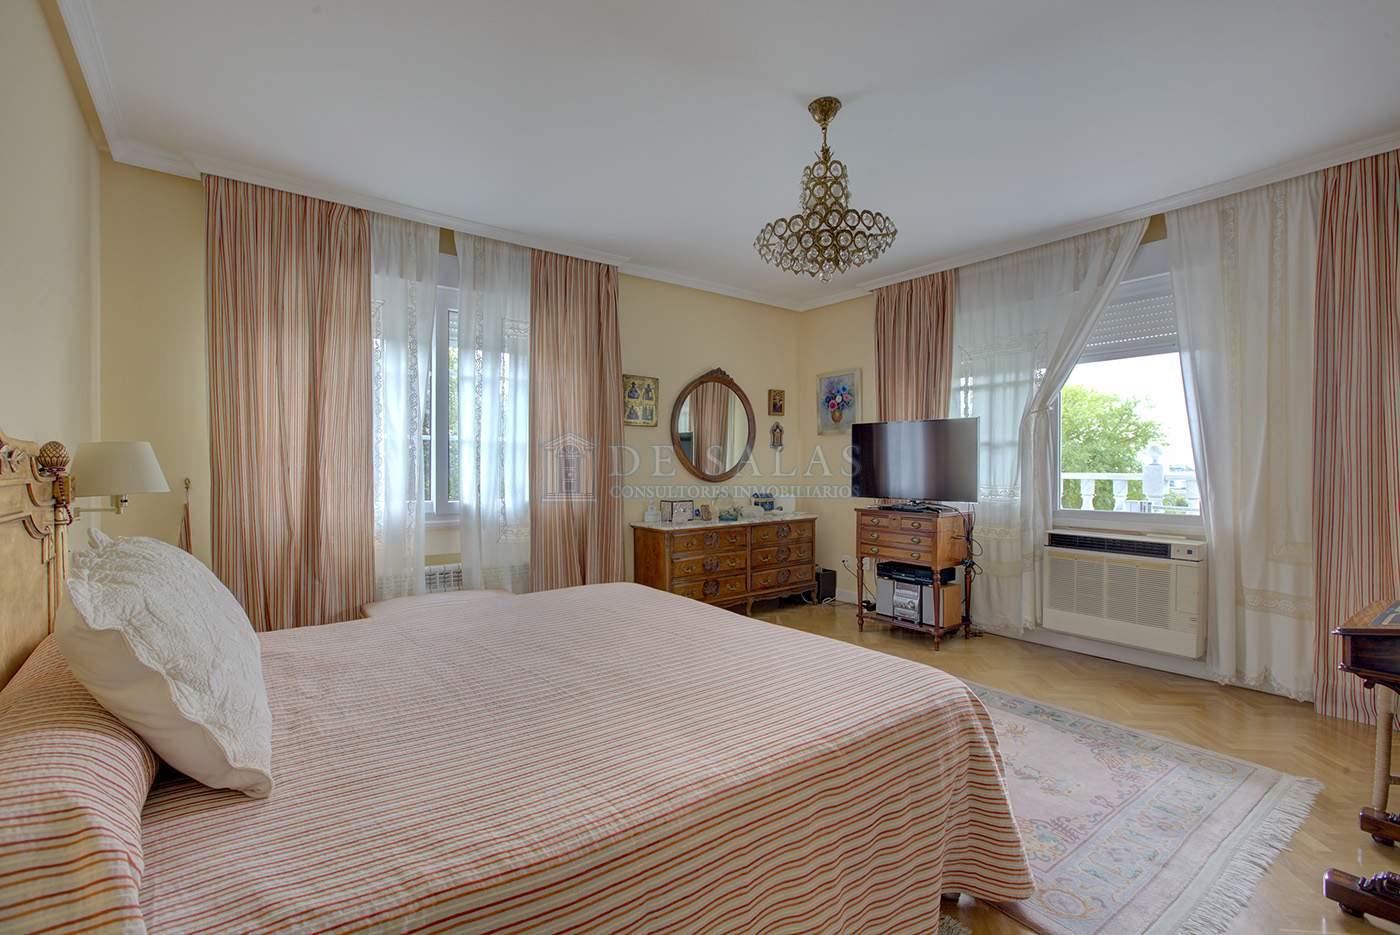 Dormitorio-IMG_7405_6_7 copia Chalet La Moraleja